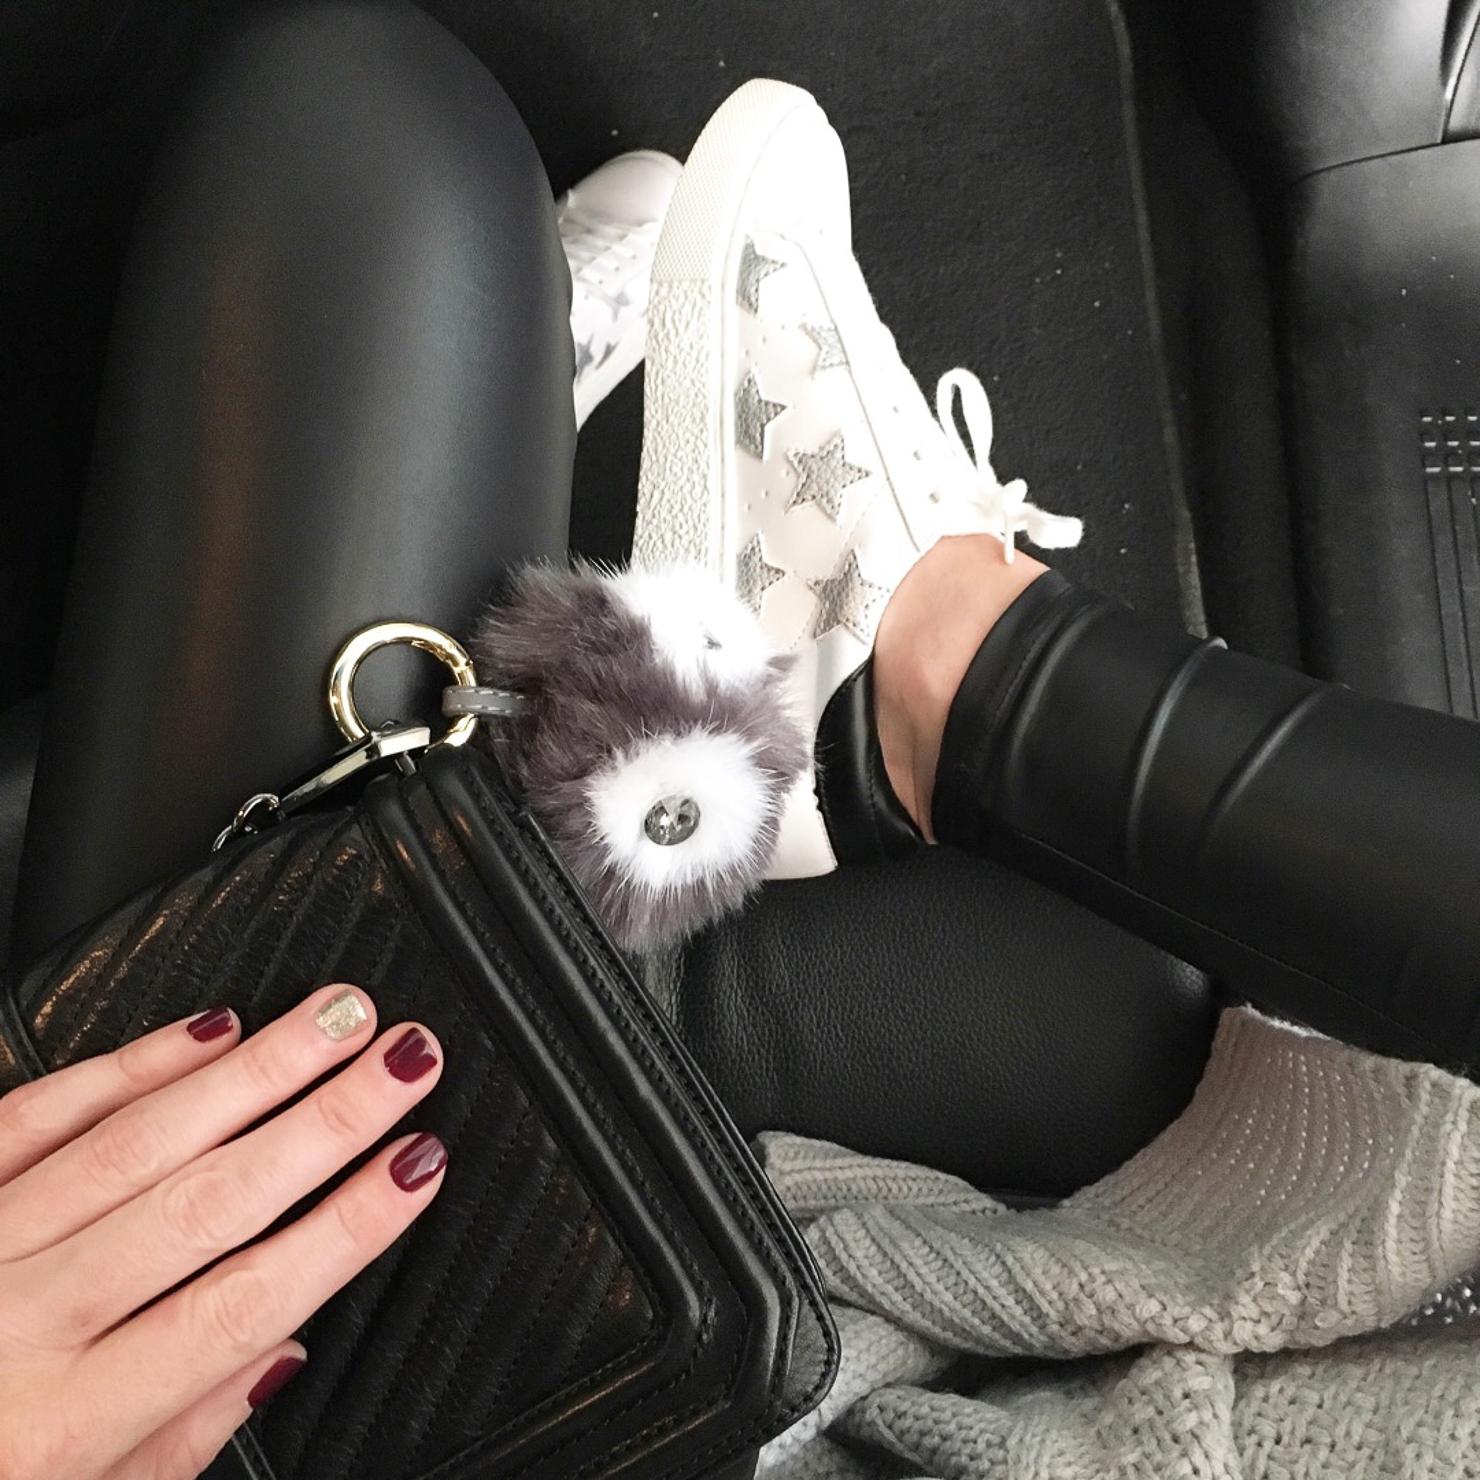 star-sneakers-leather-leggings-owl-bag-charm-instagram